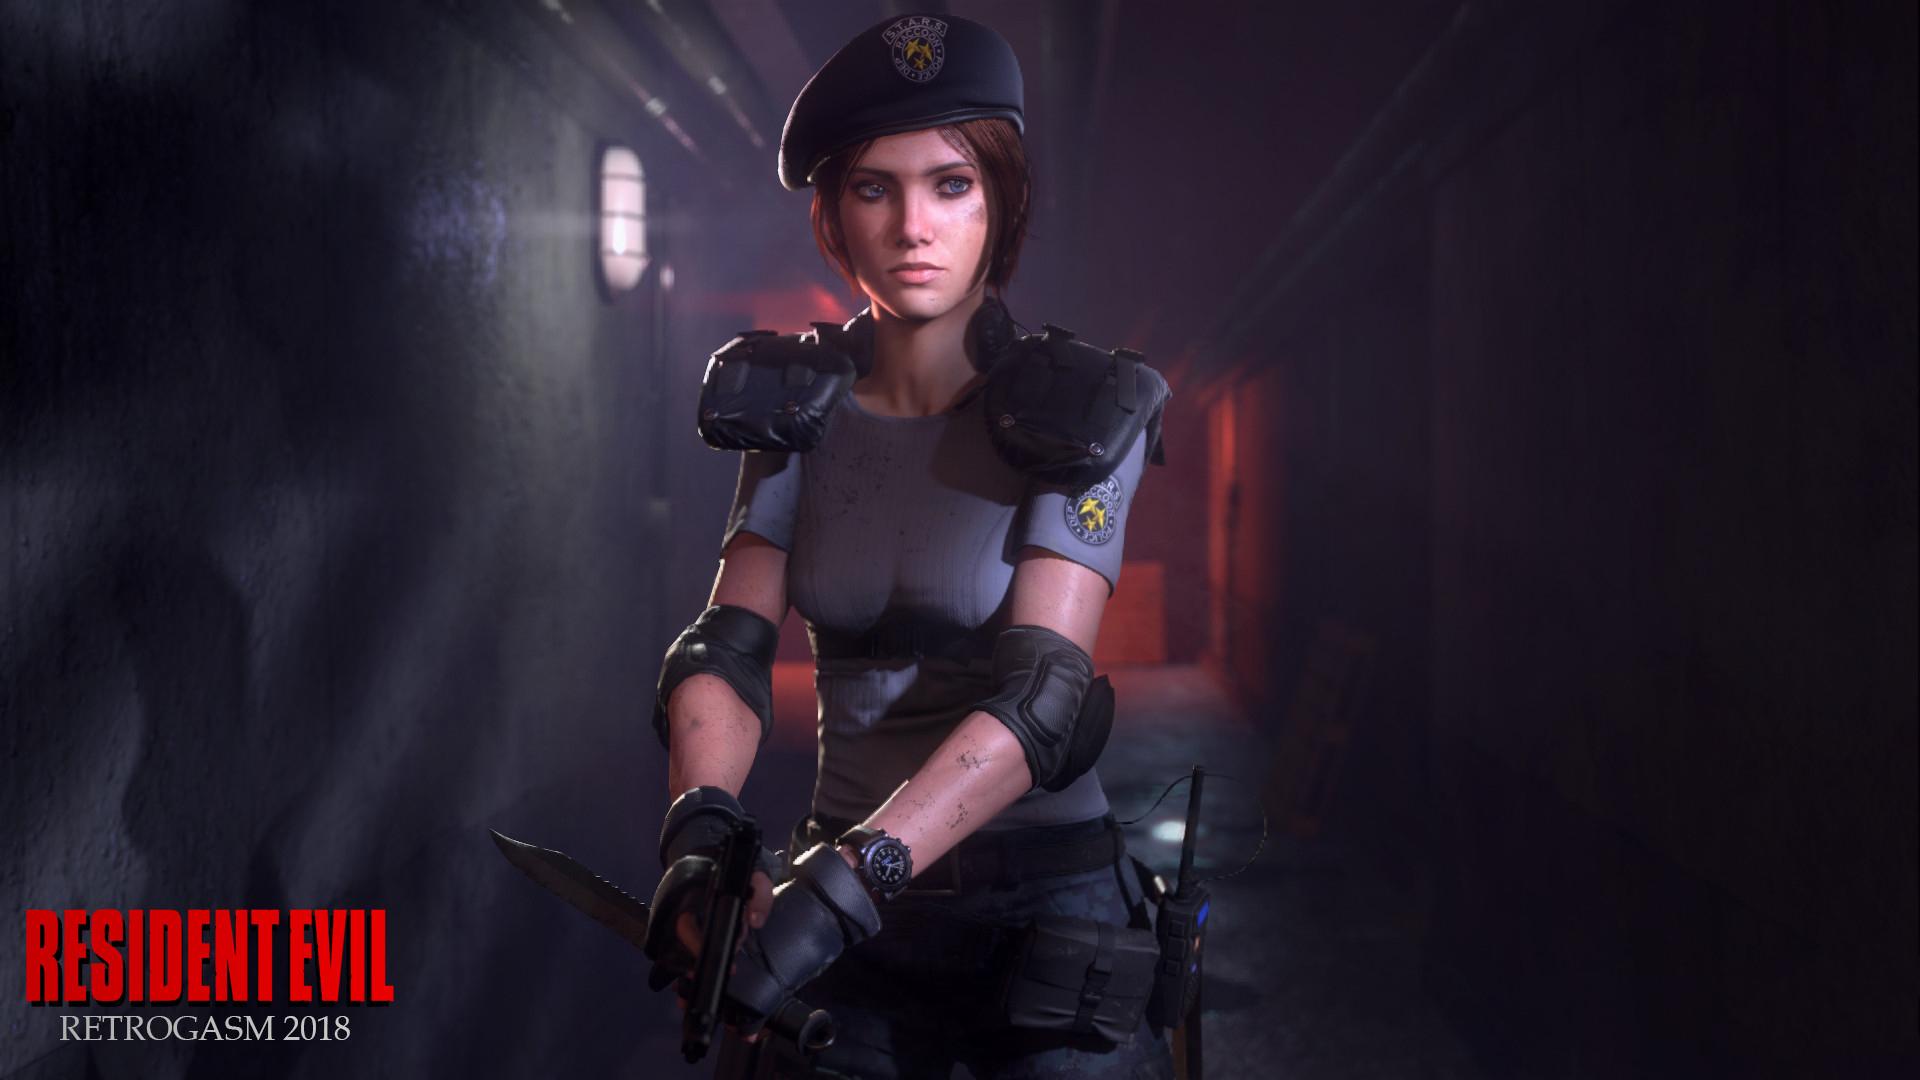 Resident Evil Hd Wallpaper Background Image 1920x1080